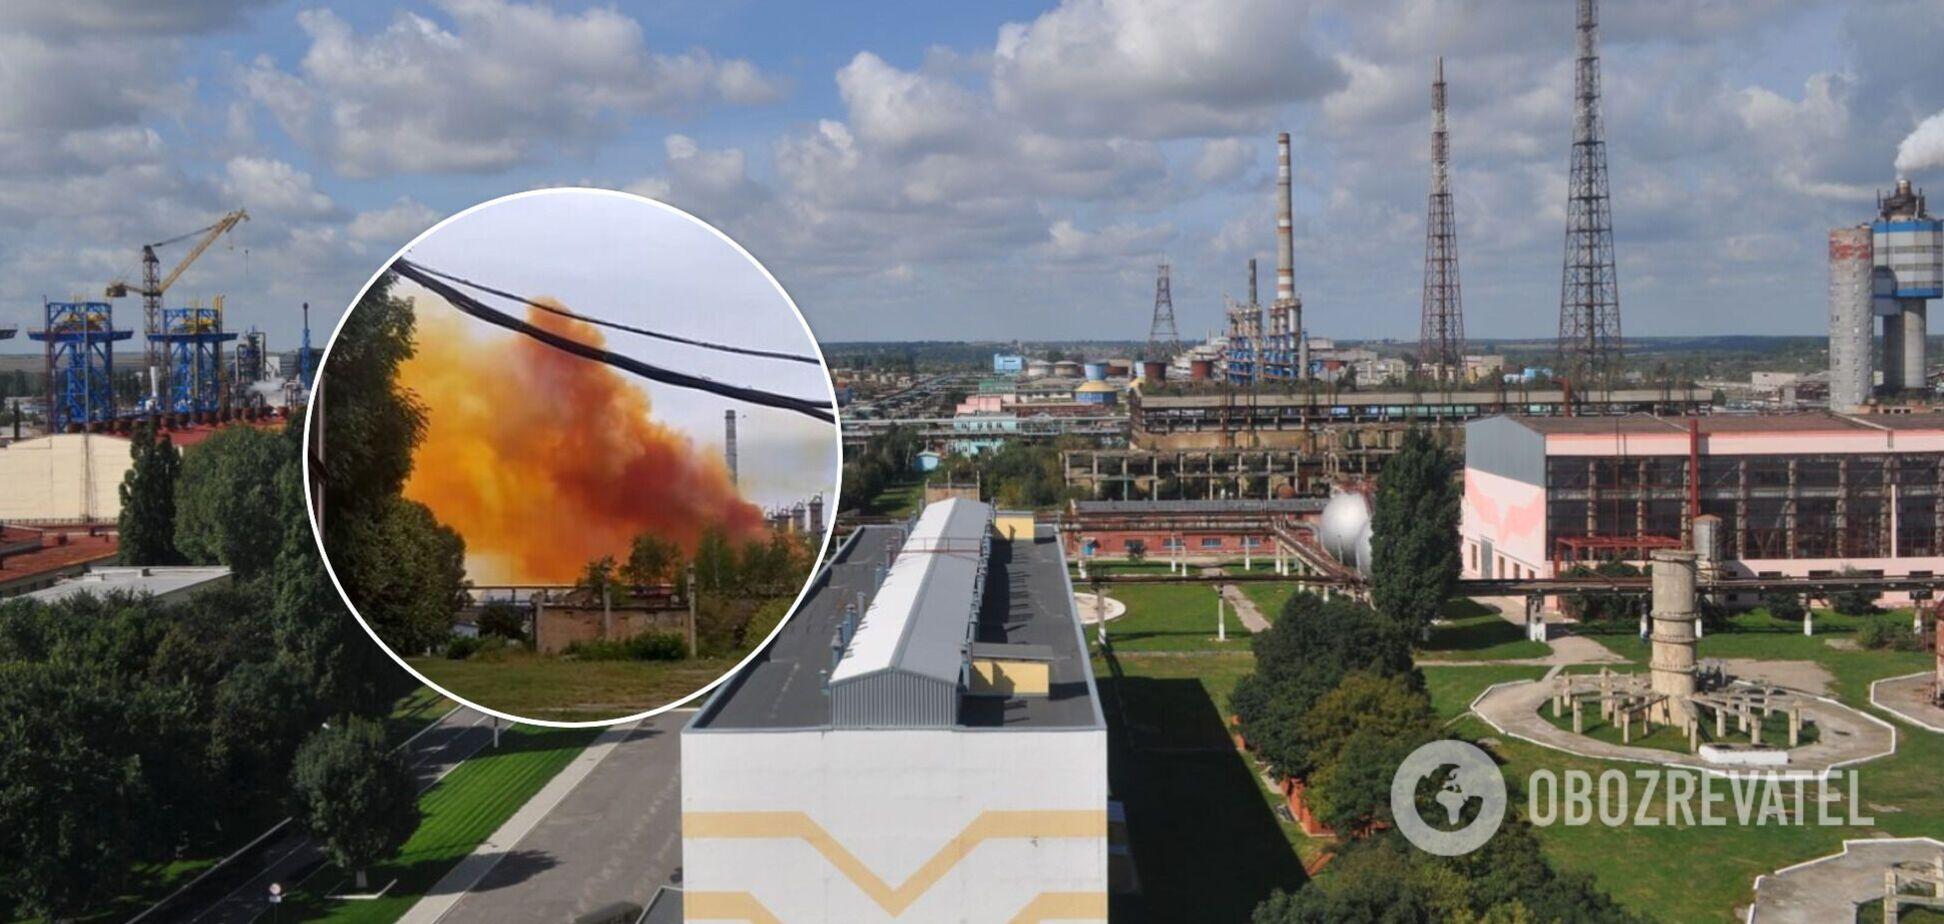 Цимбалюк назвал министра Абрамовского ответственным за аварию на 'Ривнеазоте'